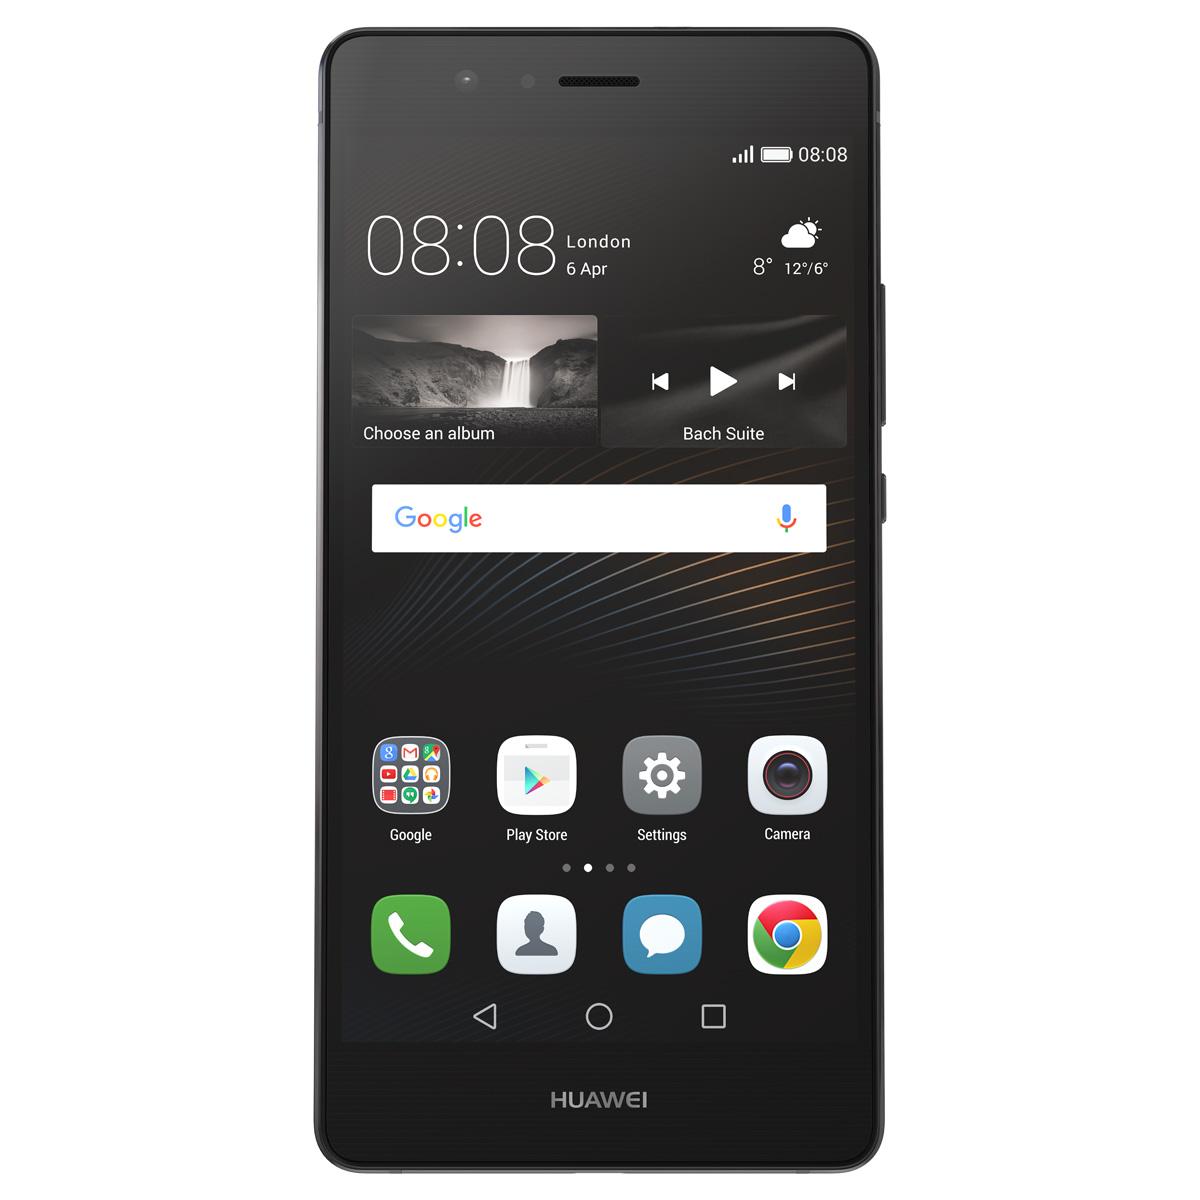 Huawei P9 Lite (4G) - Black, Silver  HU-P9-LITE